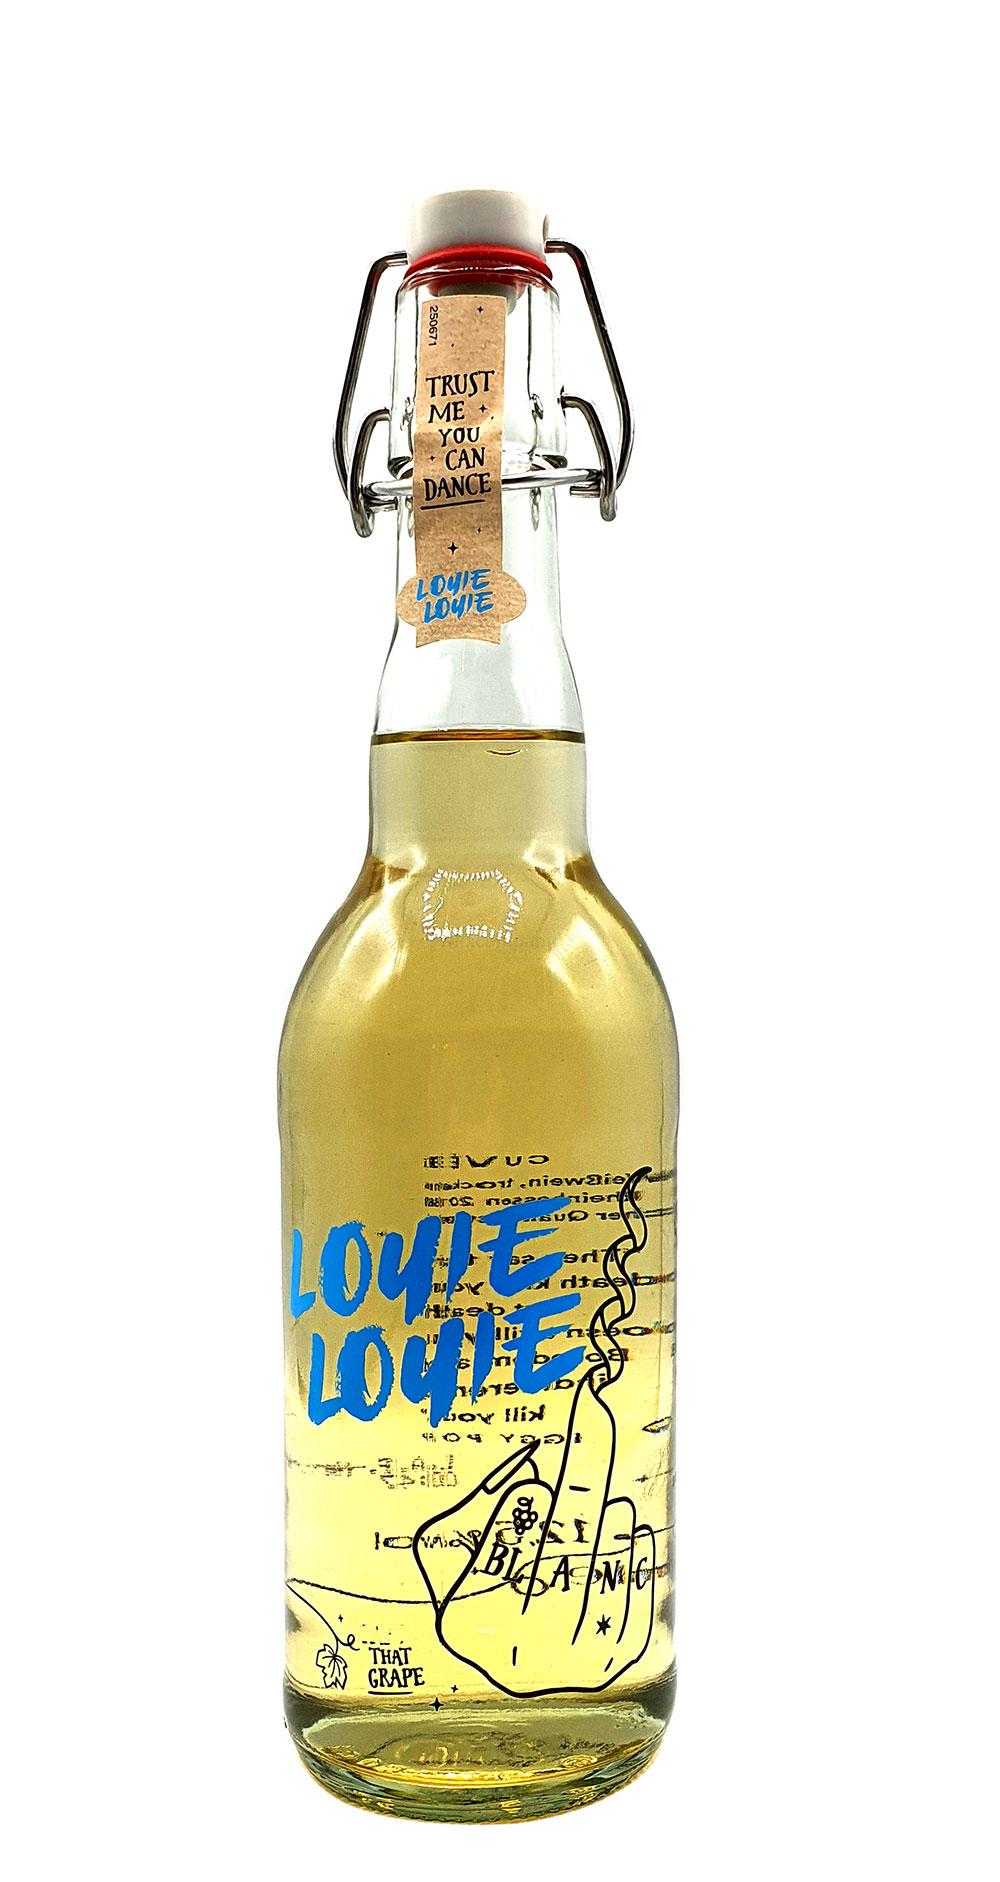 Louie Louie Cuvee Weißwein - Trust me you can dance - 0,5l (12,5% Vol) [Enthält Sulfite]